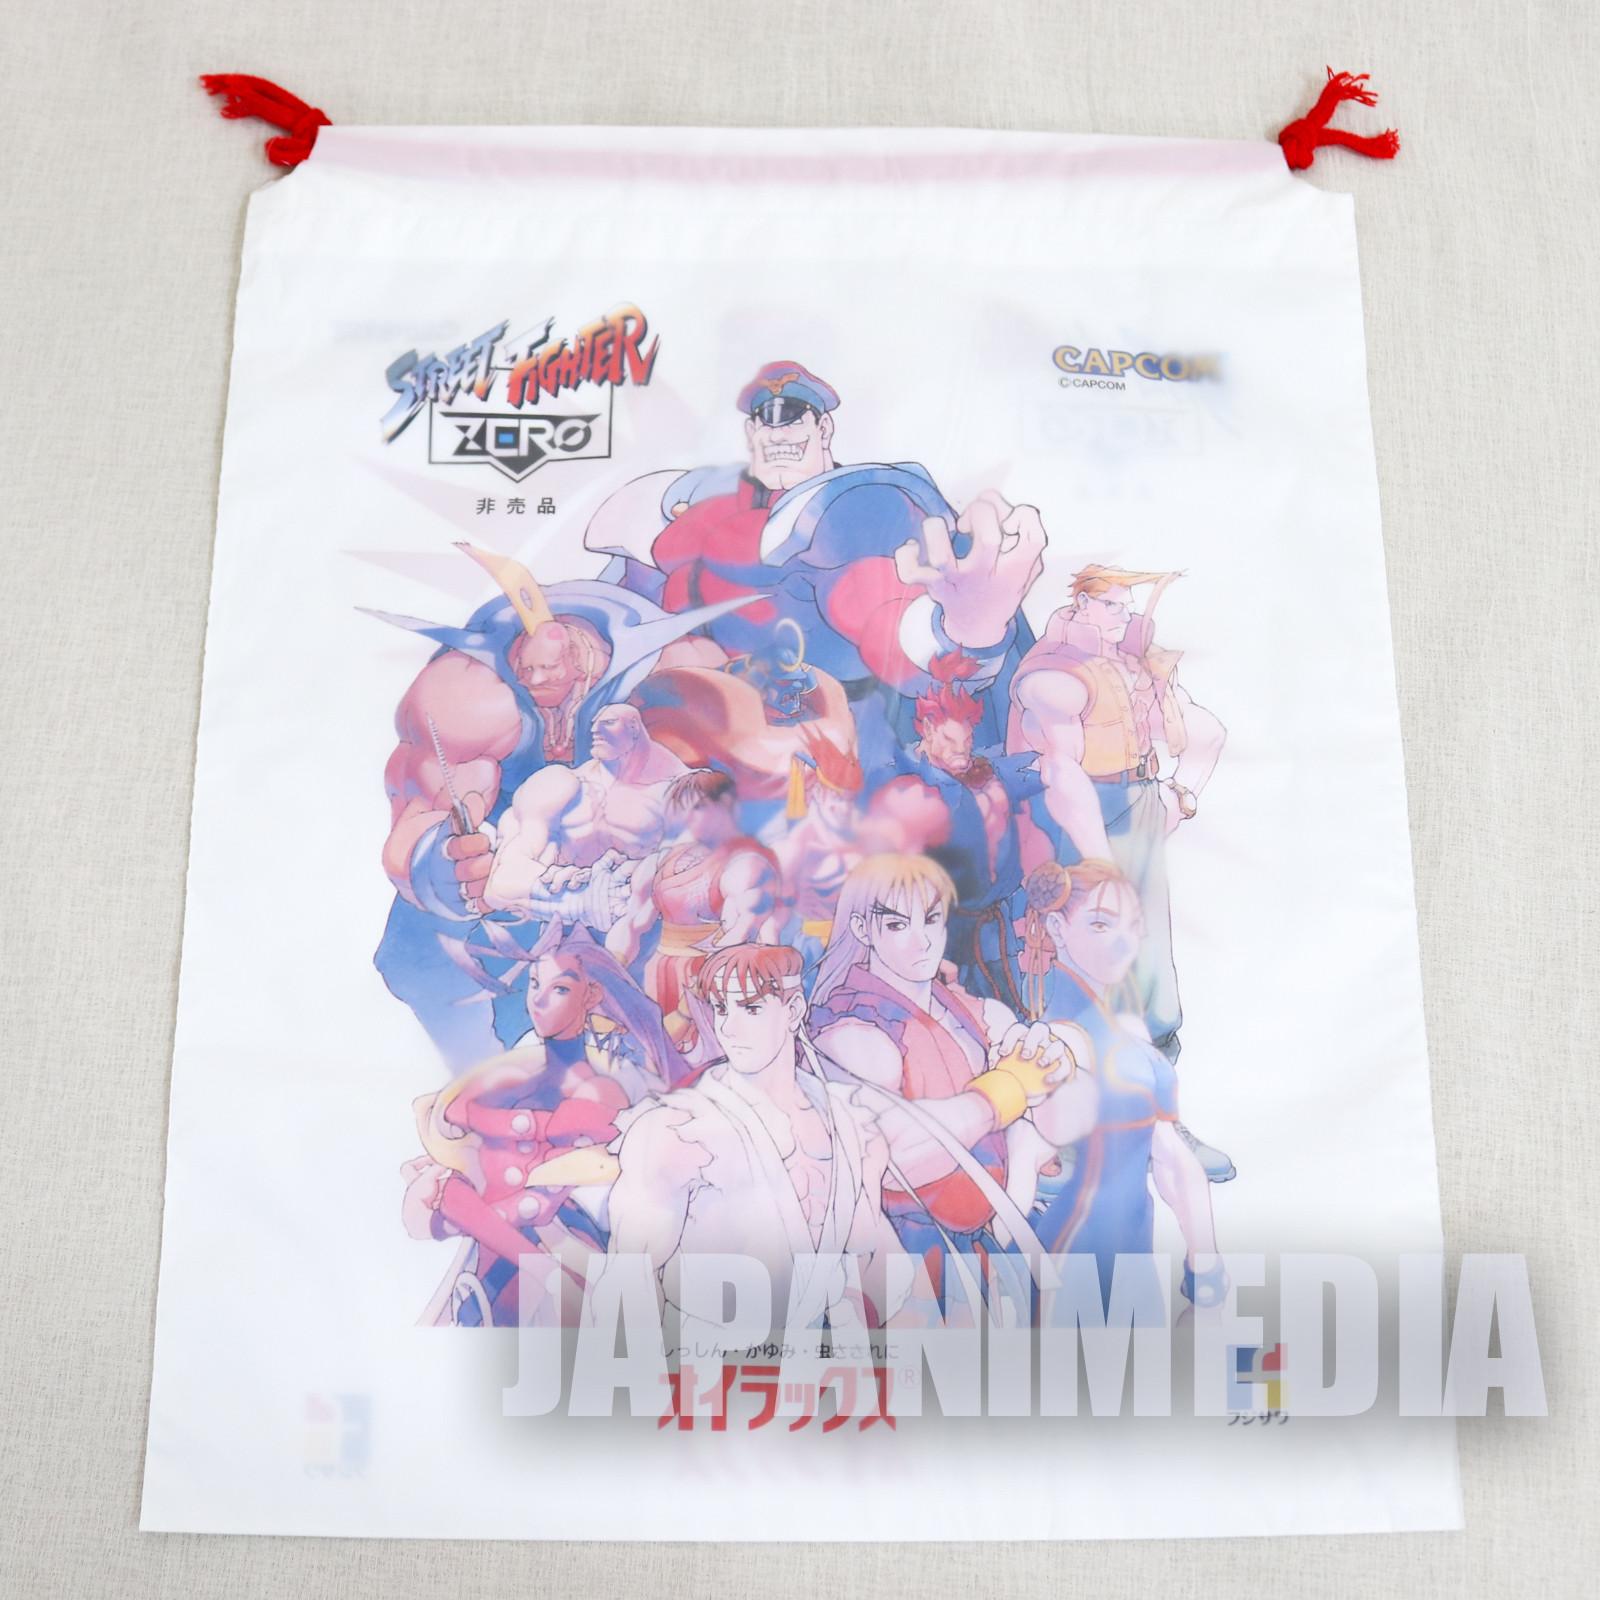 Street Fighter Zero Promotion Vinyl Drawstring Bag #2 JAPAN GAME ALPHA